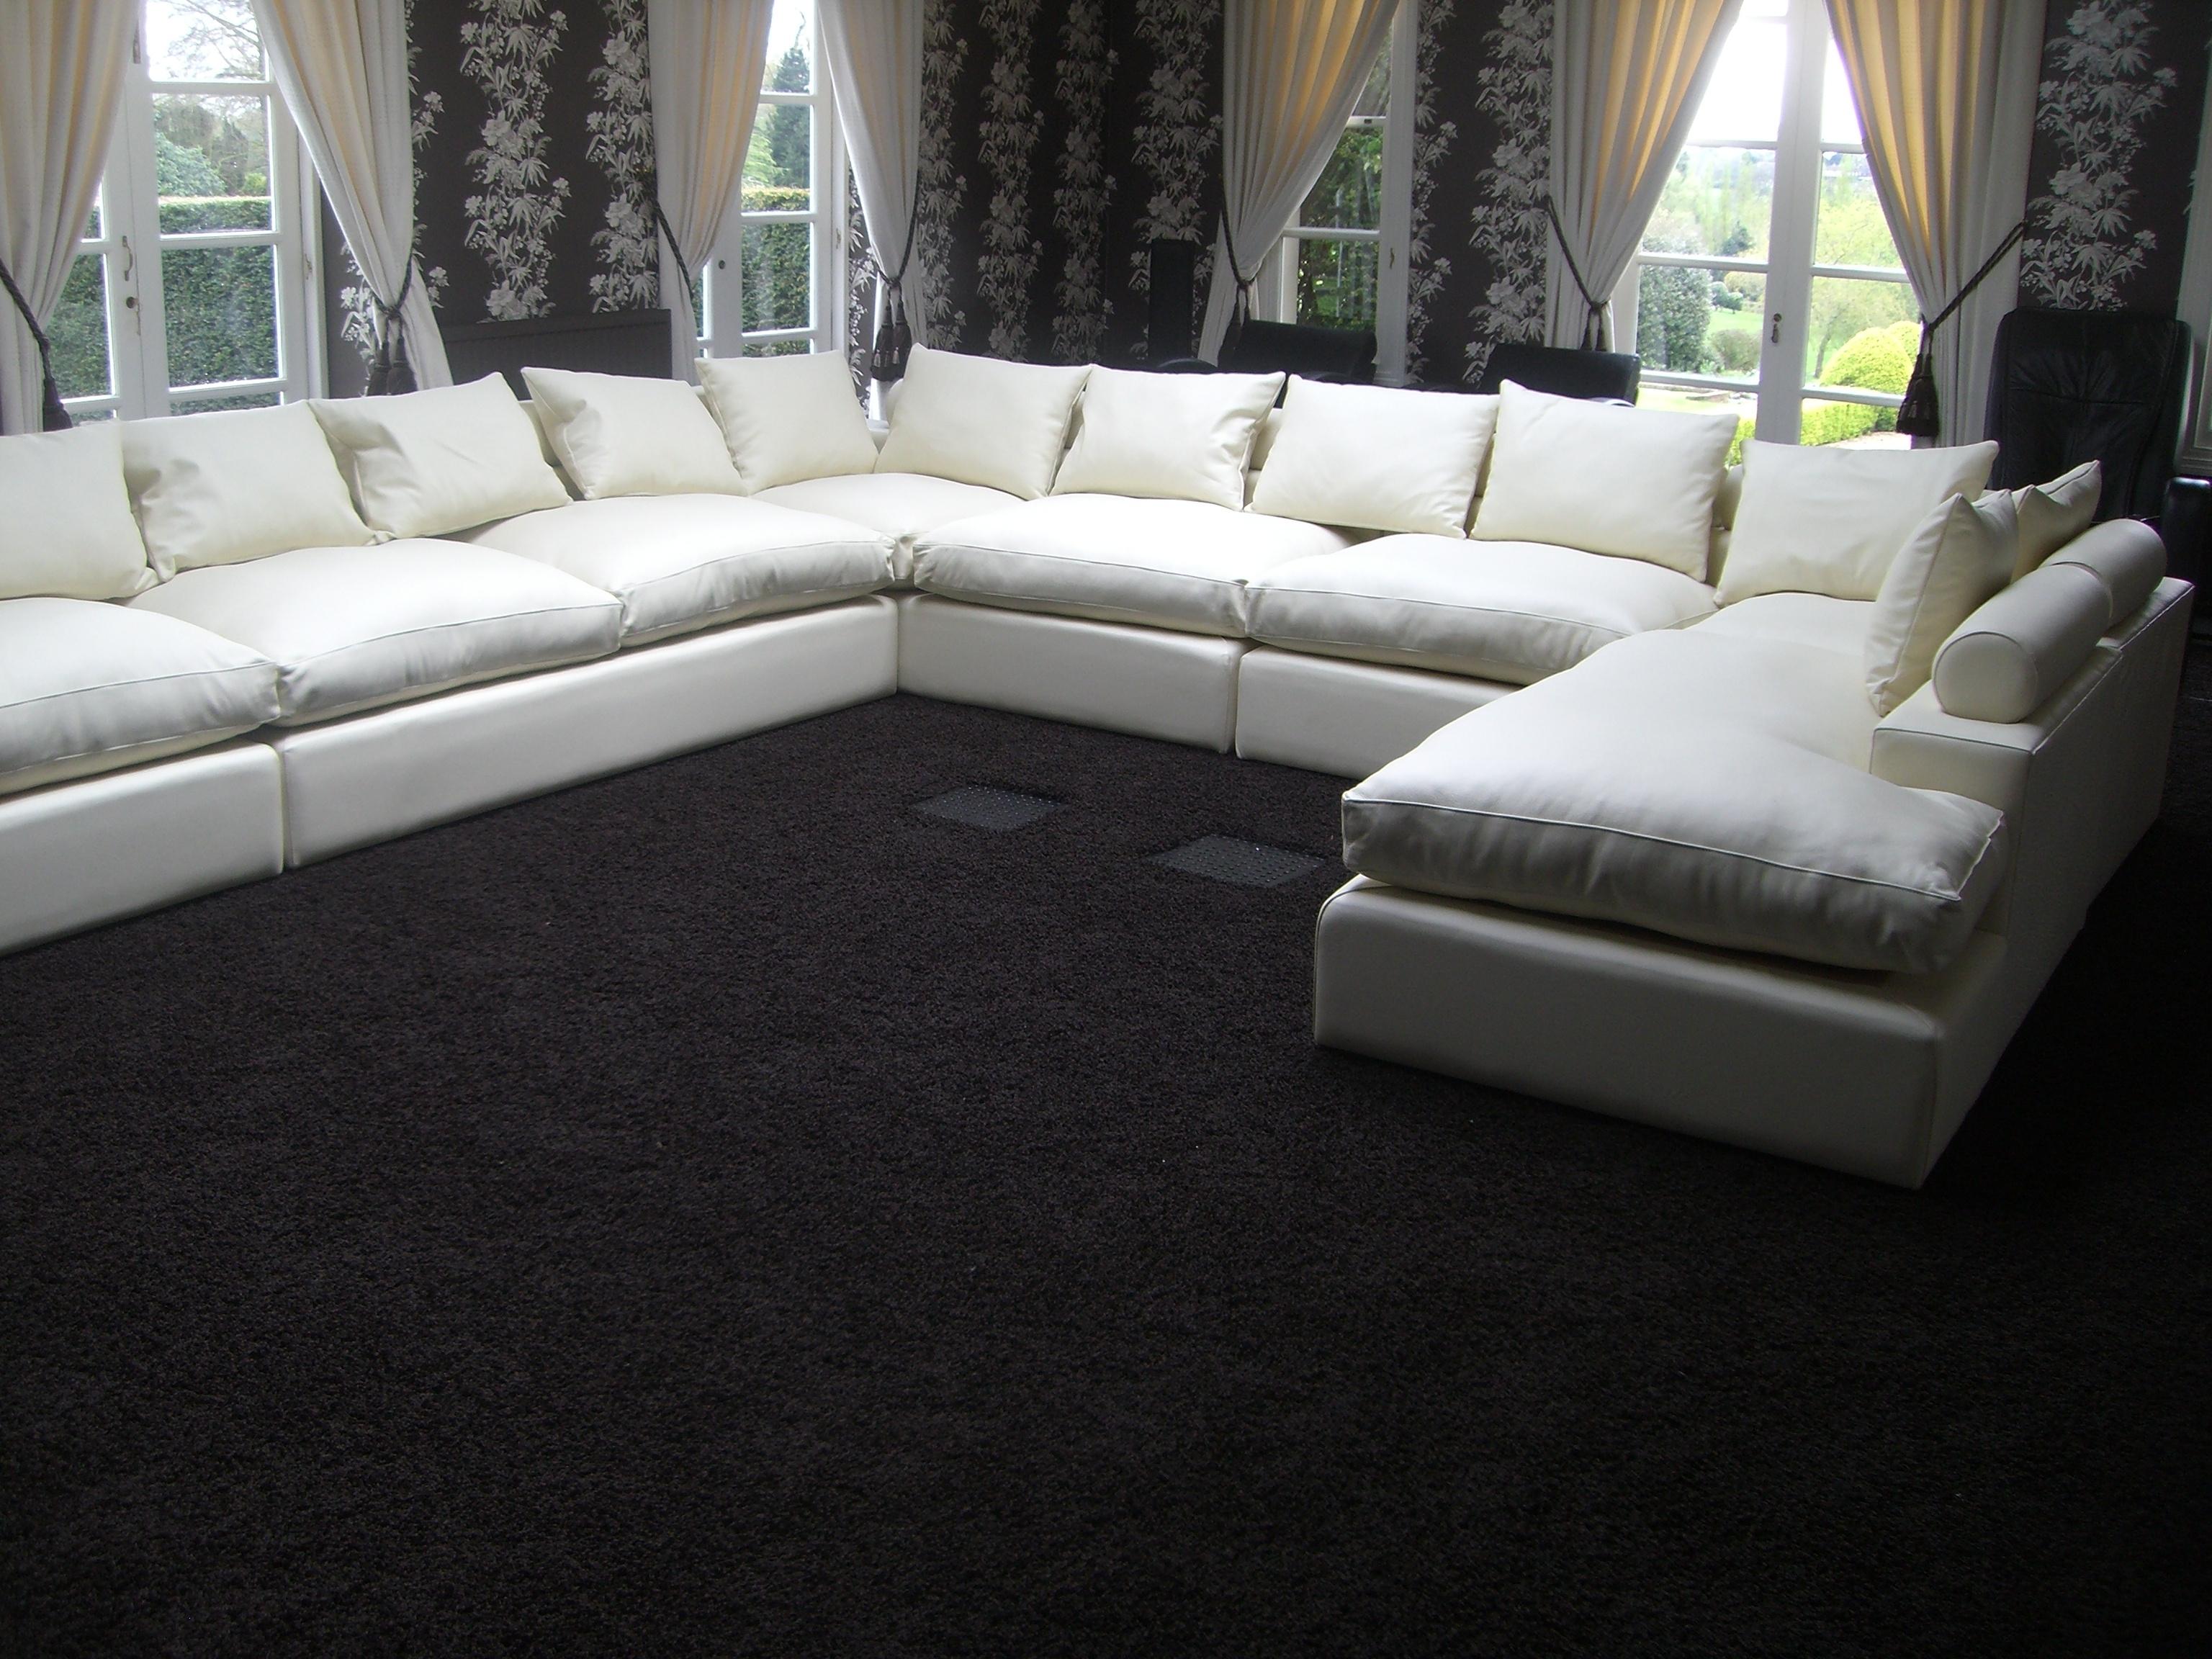 Sofa : Modern Sectional Sofas Leather Corner Sofa Tub Sofa Elegant with Modern U Shaped Sectionals (Image 9 of 15)